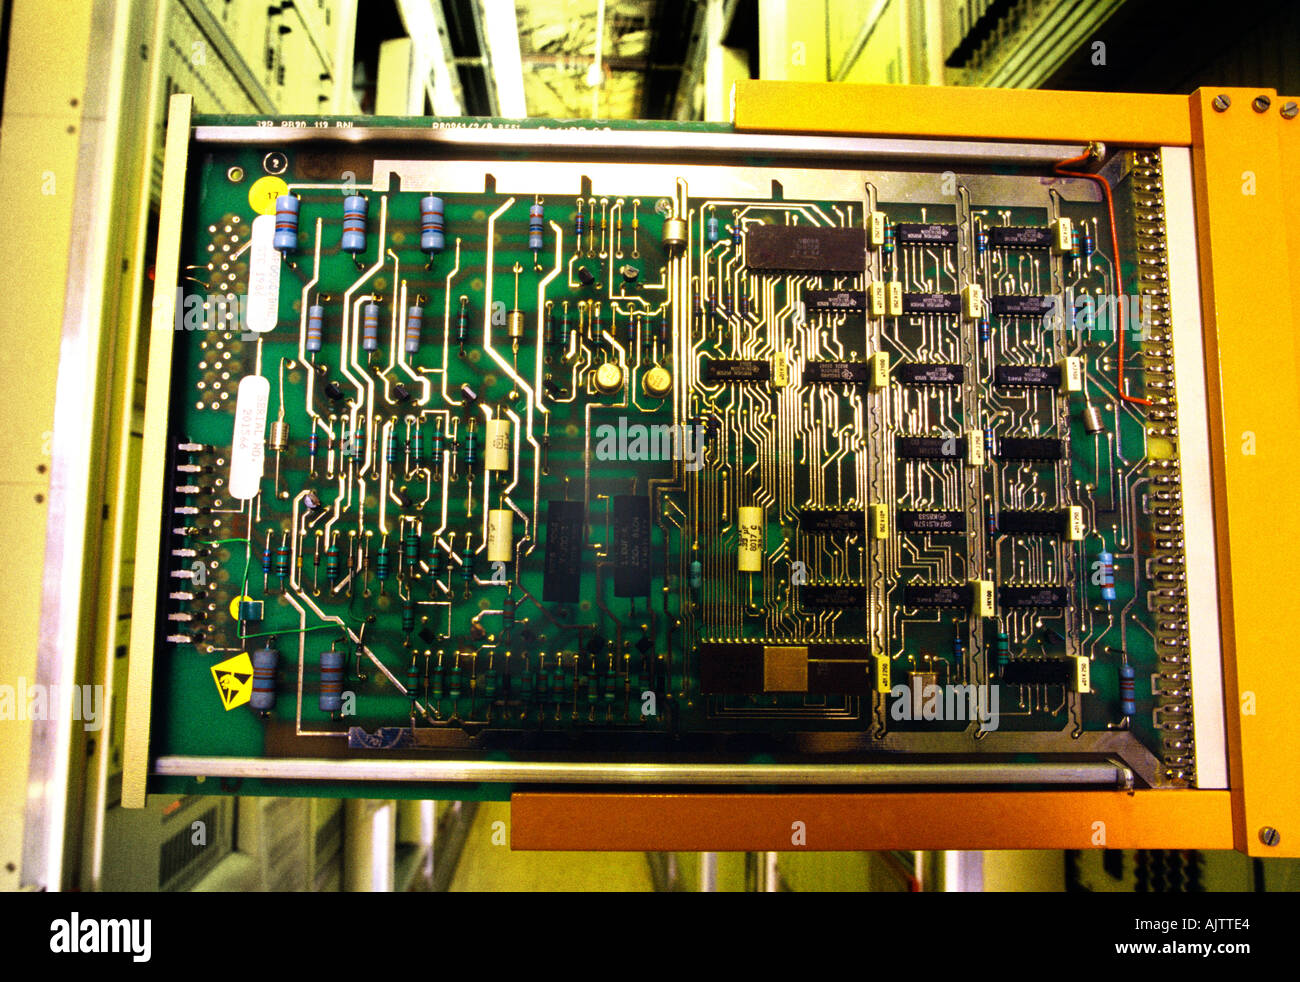 Fabulous Telephone Exchange Circuit Board Stock Photo 4835555 Alamy Wiring Digital Resources Attrlexorcompassionincorg